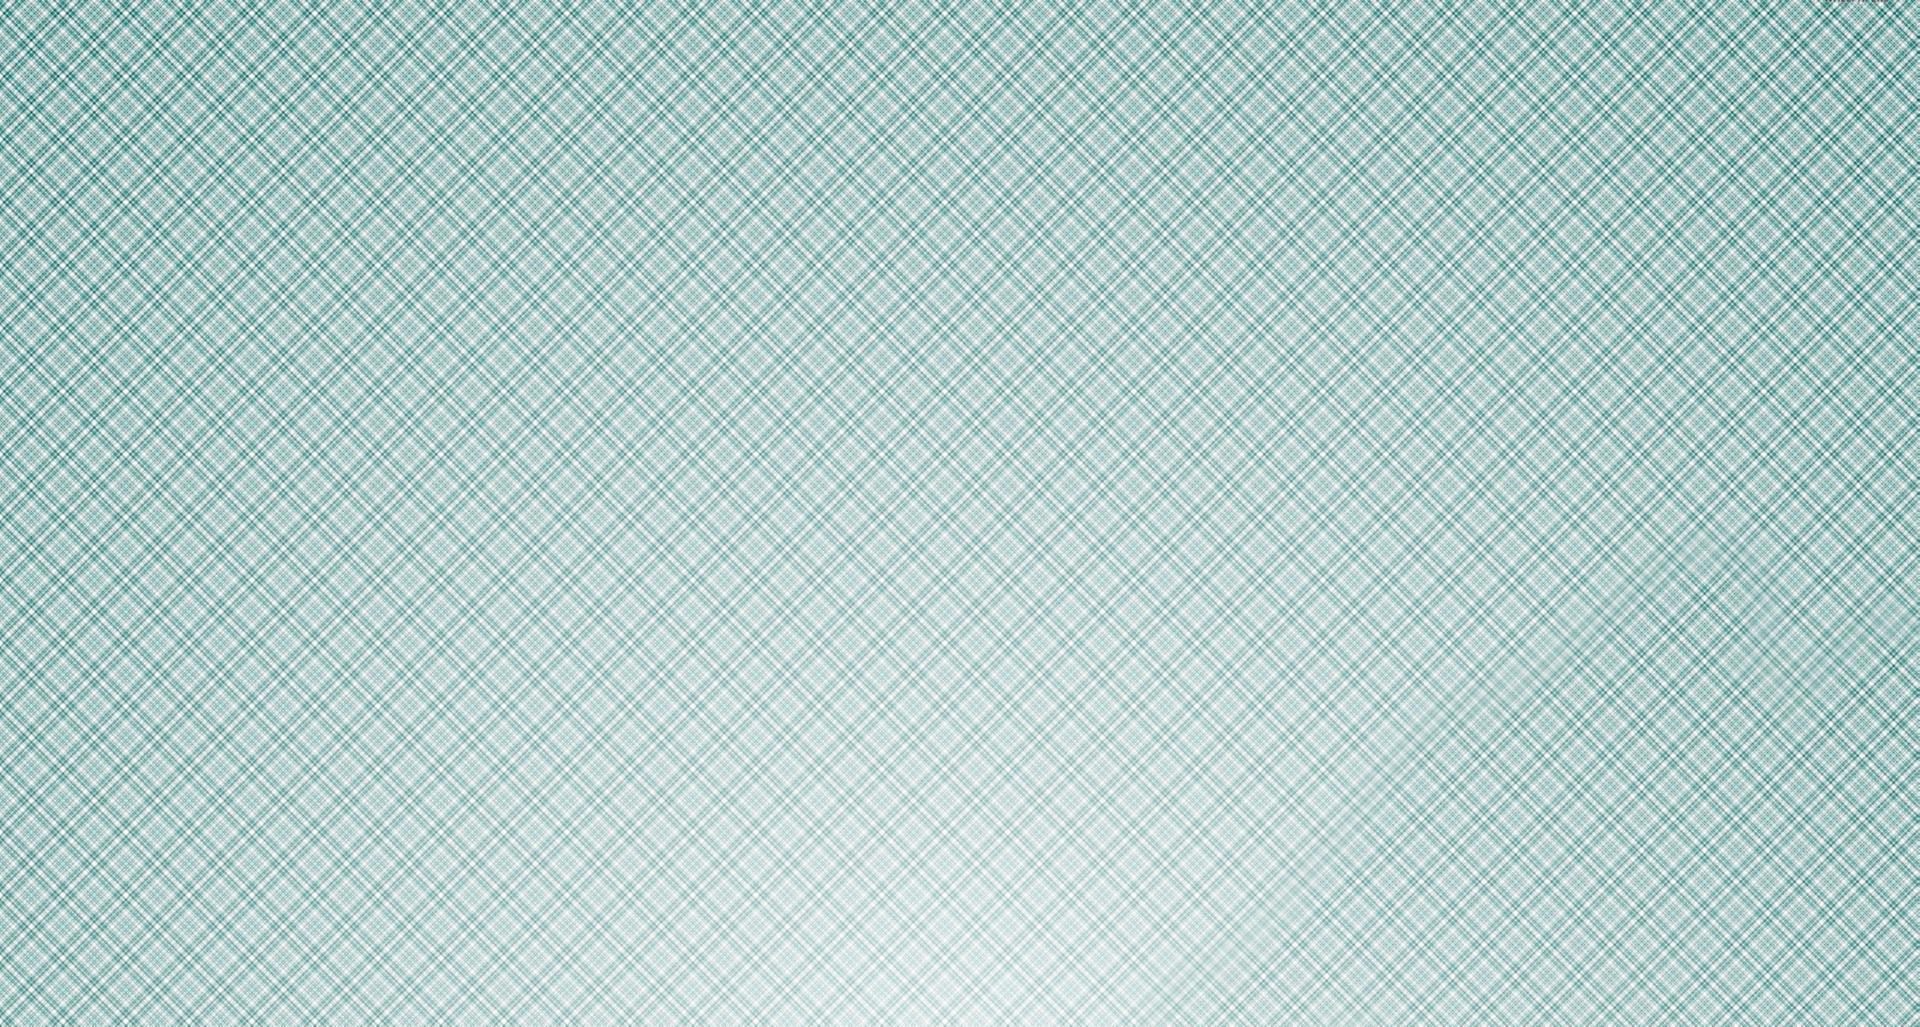 Blue plaid pattern wallpapers HD quality